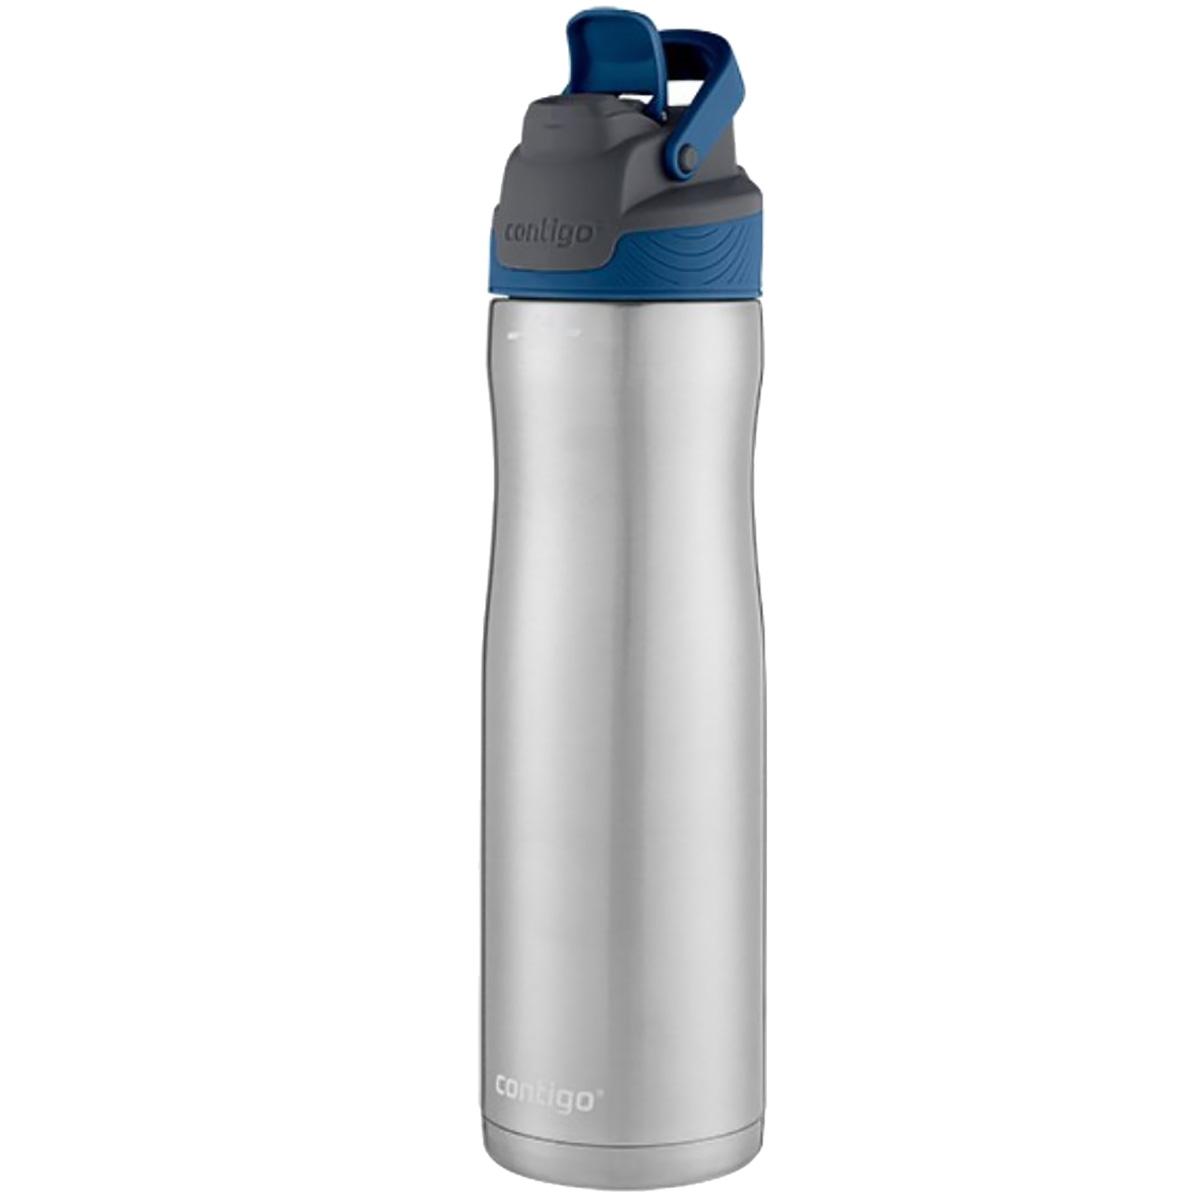 Contigo-24-oz-Chill-Autoseal-Stainless-Steel-Water-Bottle thumbnail 18